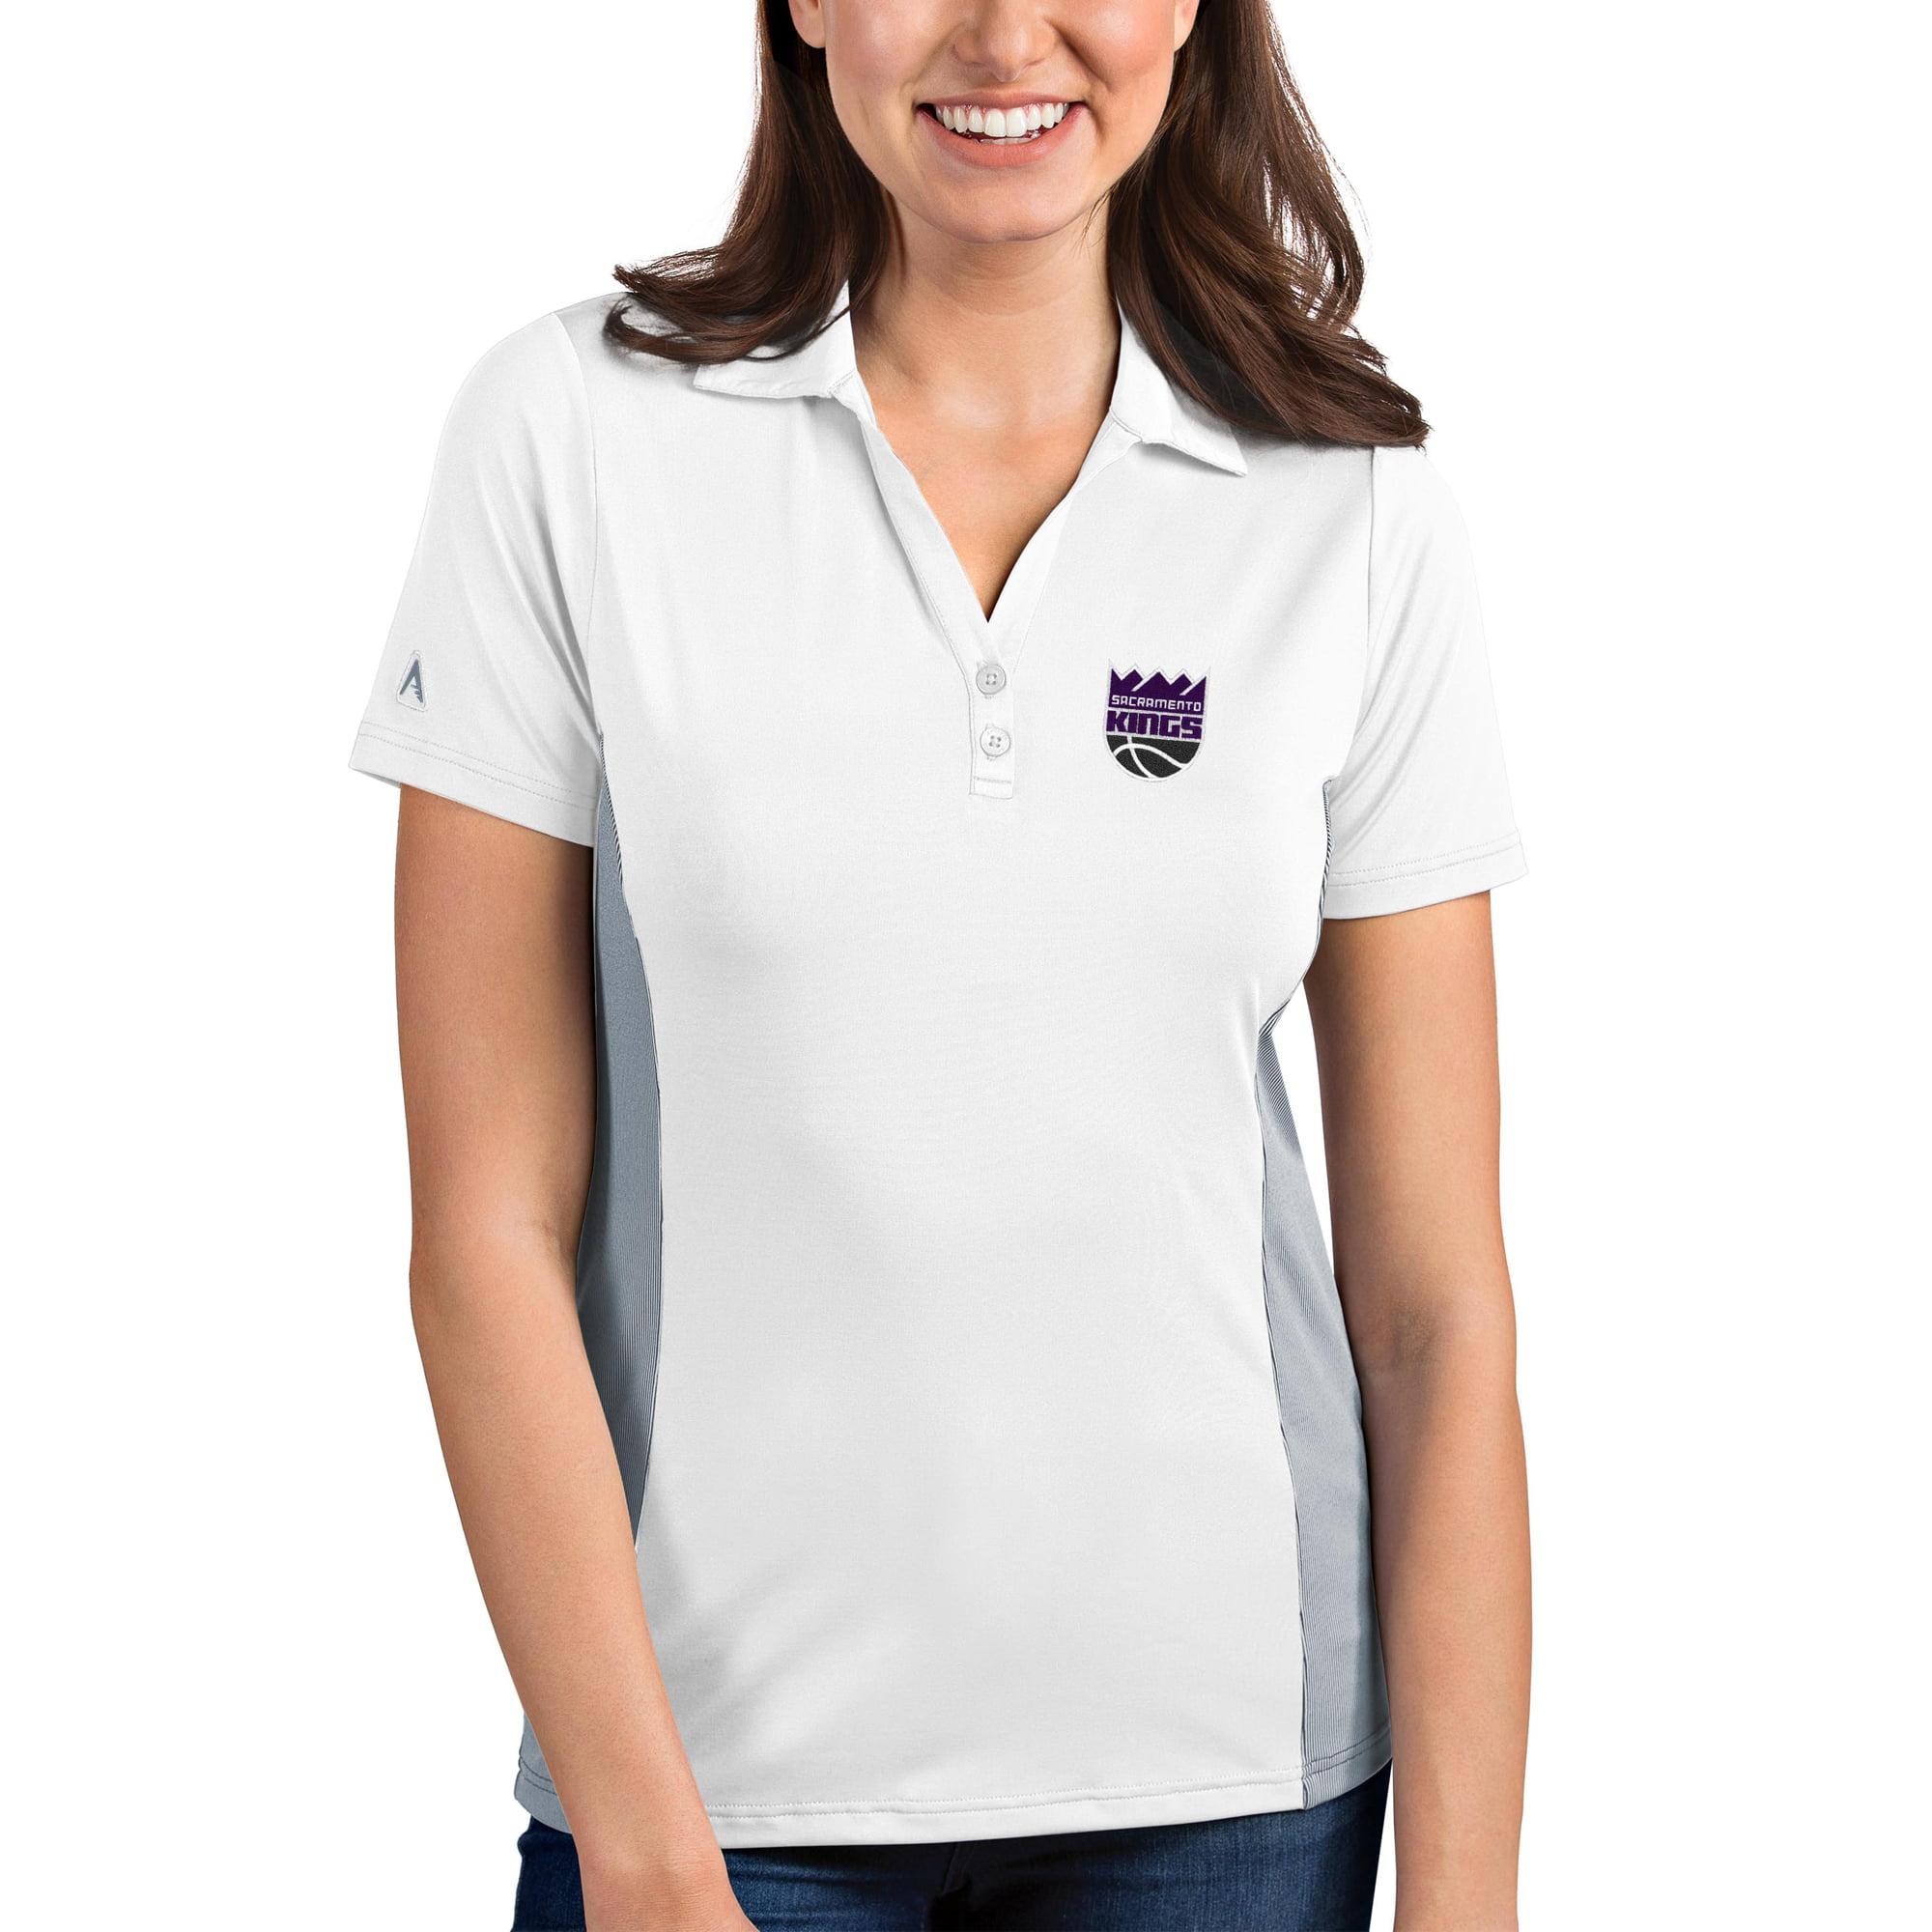 Sacramento Kings Antigua Women's Venture Polo - White/Gray